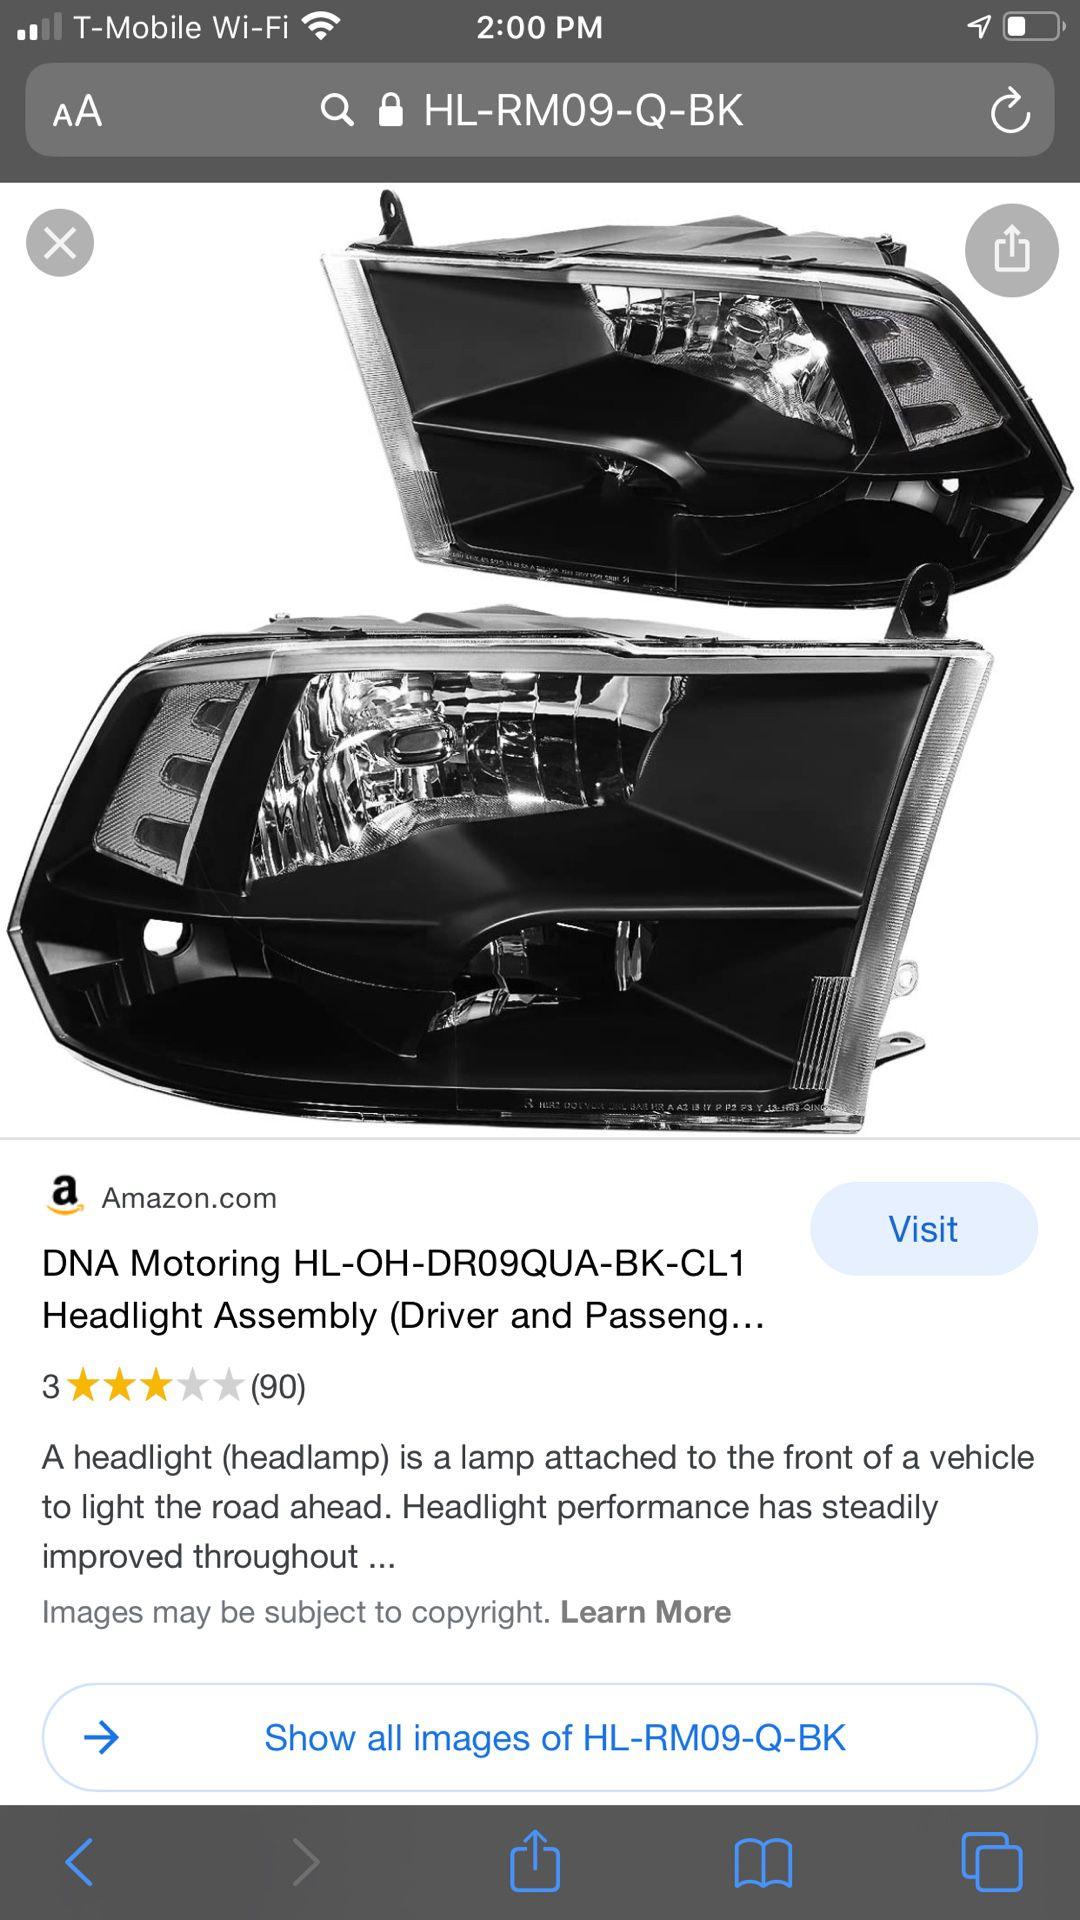 09-18 Ram headlights